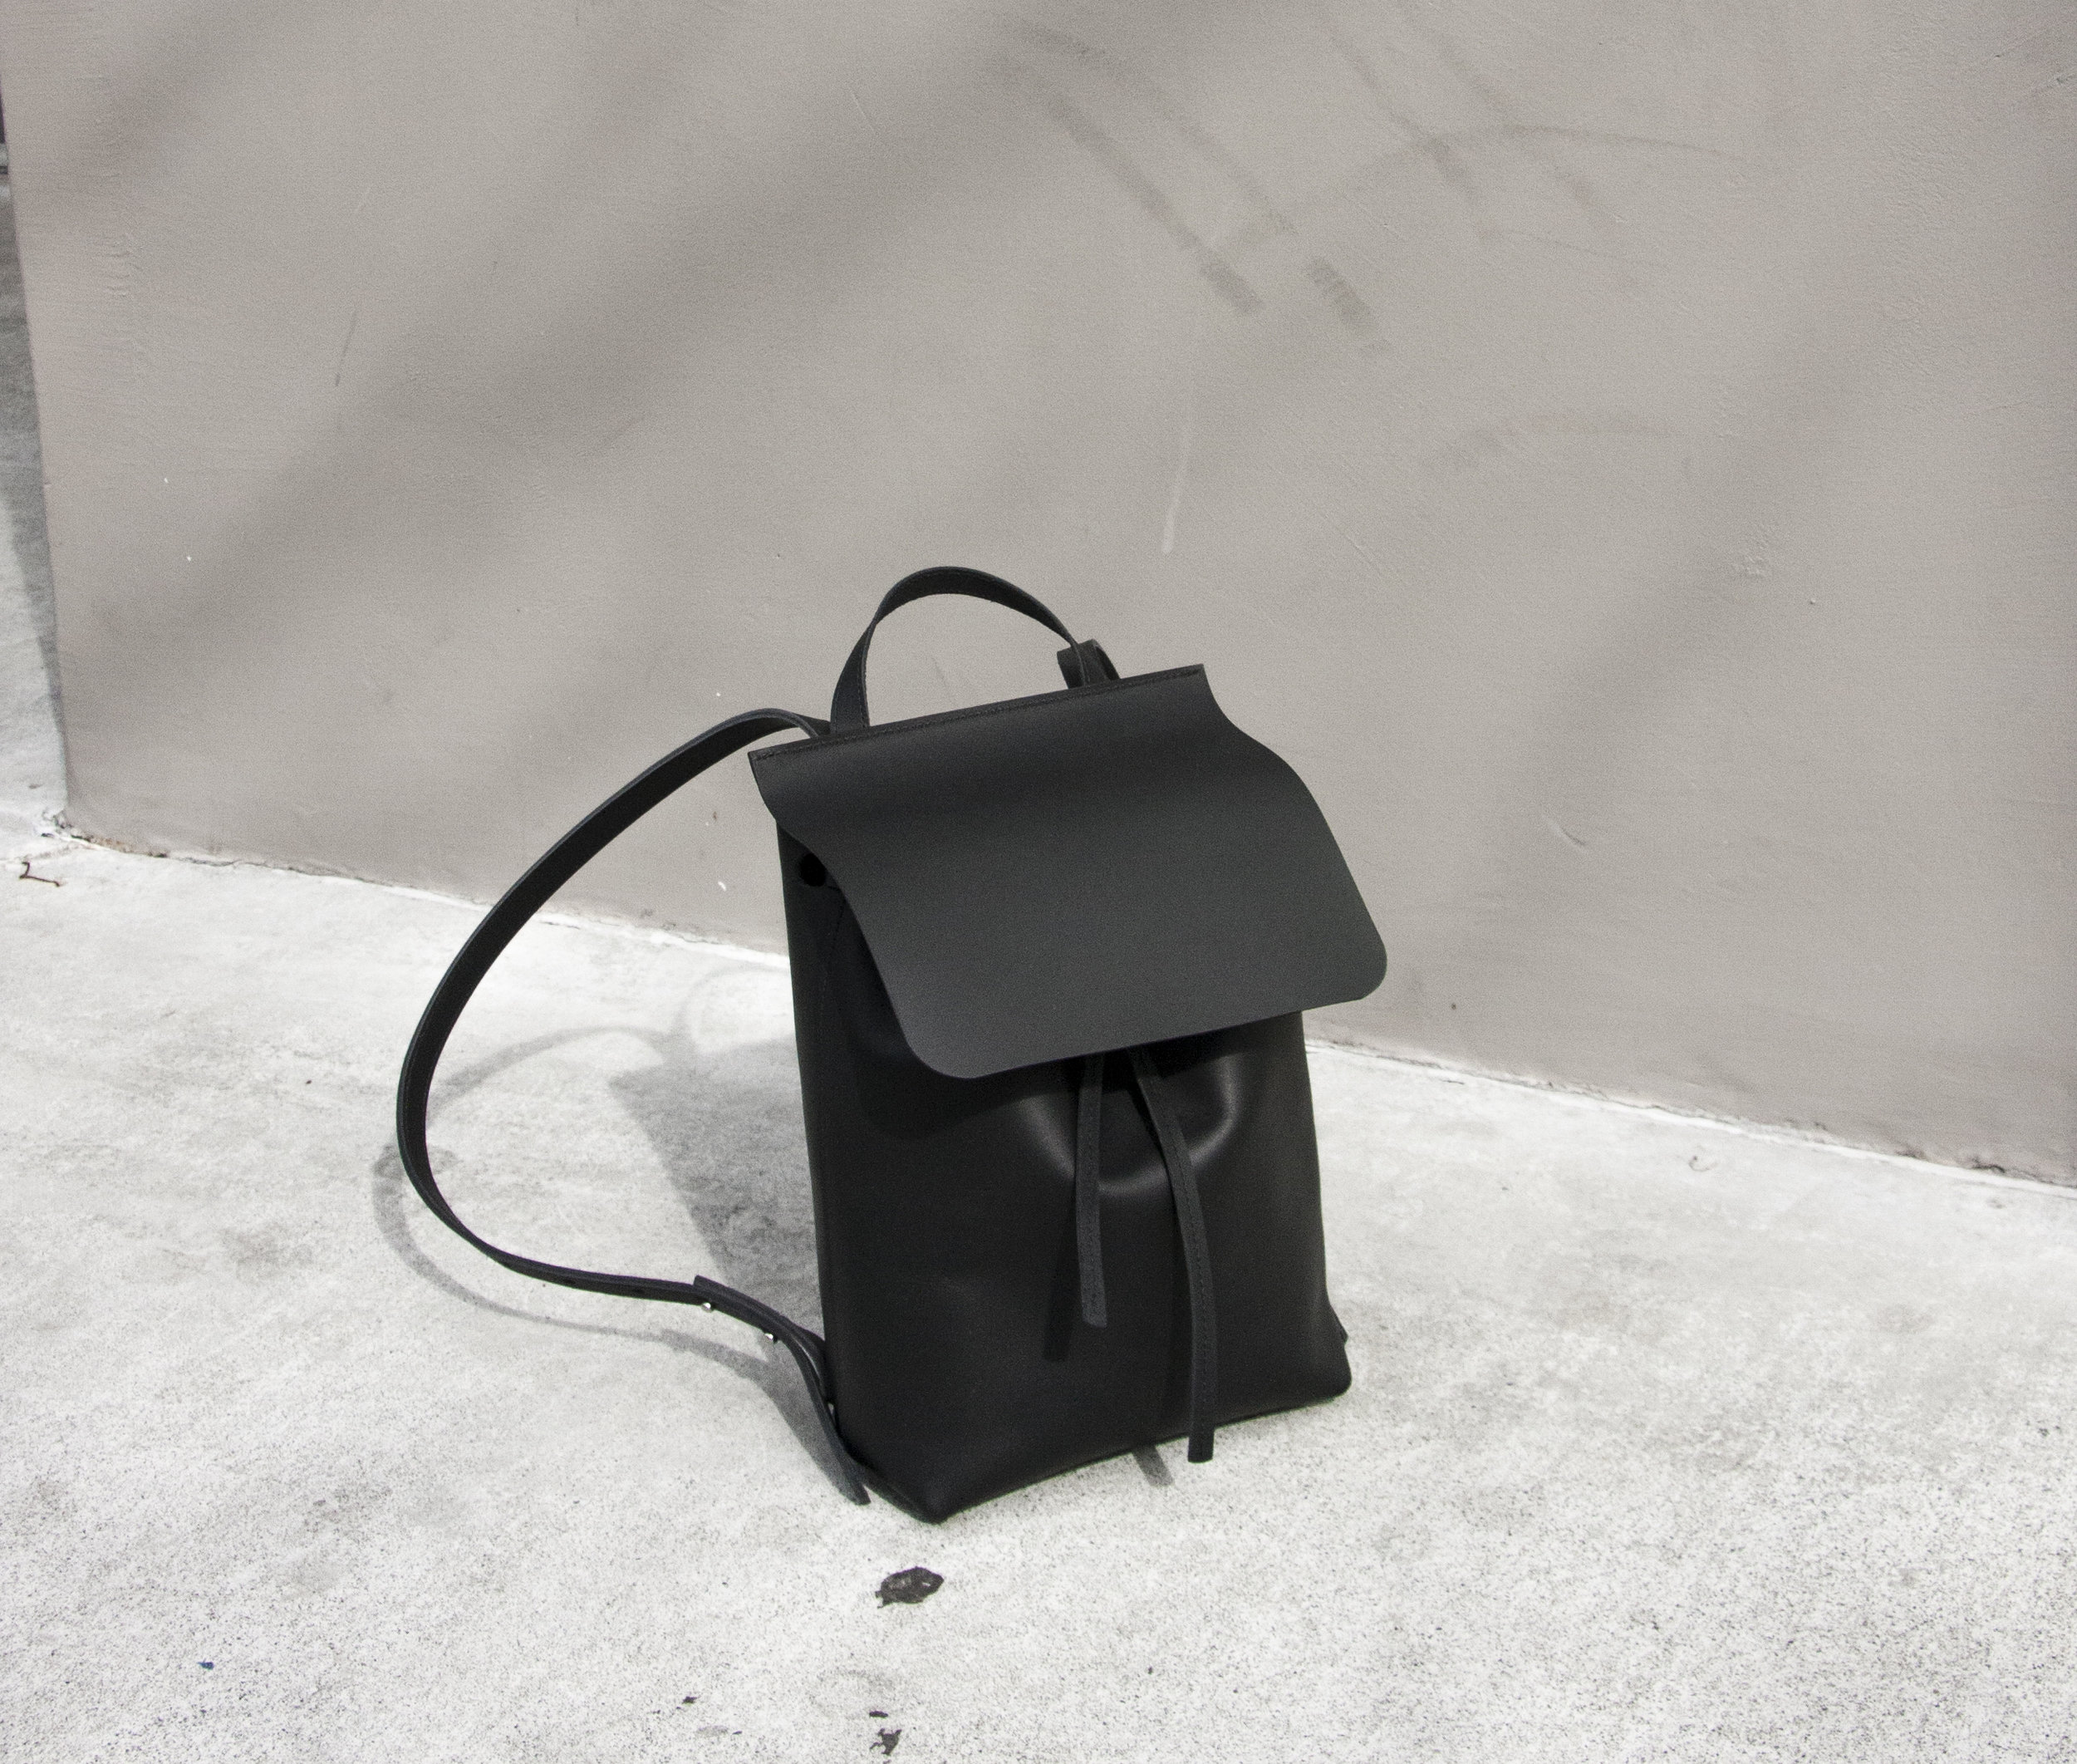 BBackpack_Outdoors_Feb1c.jpg